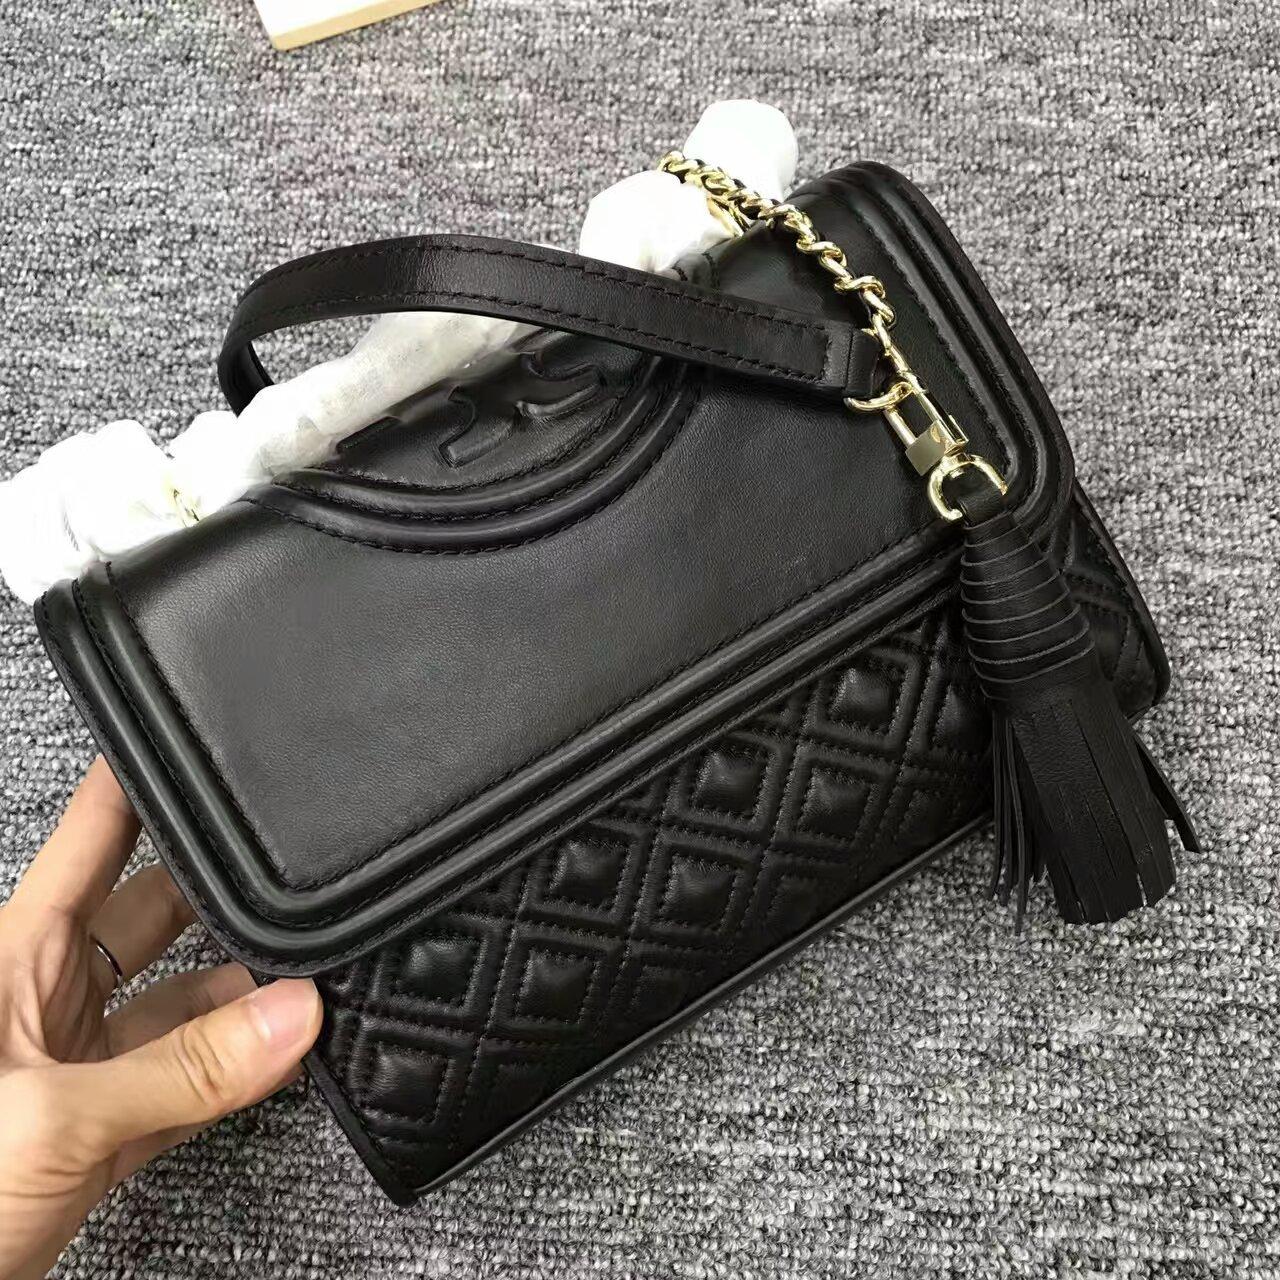 d2d1fb9e93c Mmexport1481901884542. Mmexport1481901884542. Previous. Authentic Tory  Burch Fleming Convertible Leather Shoulder Bag Small Black